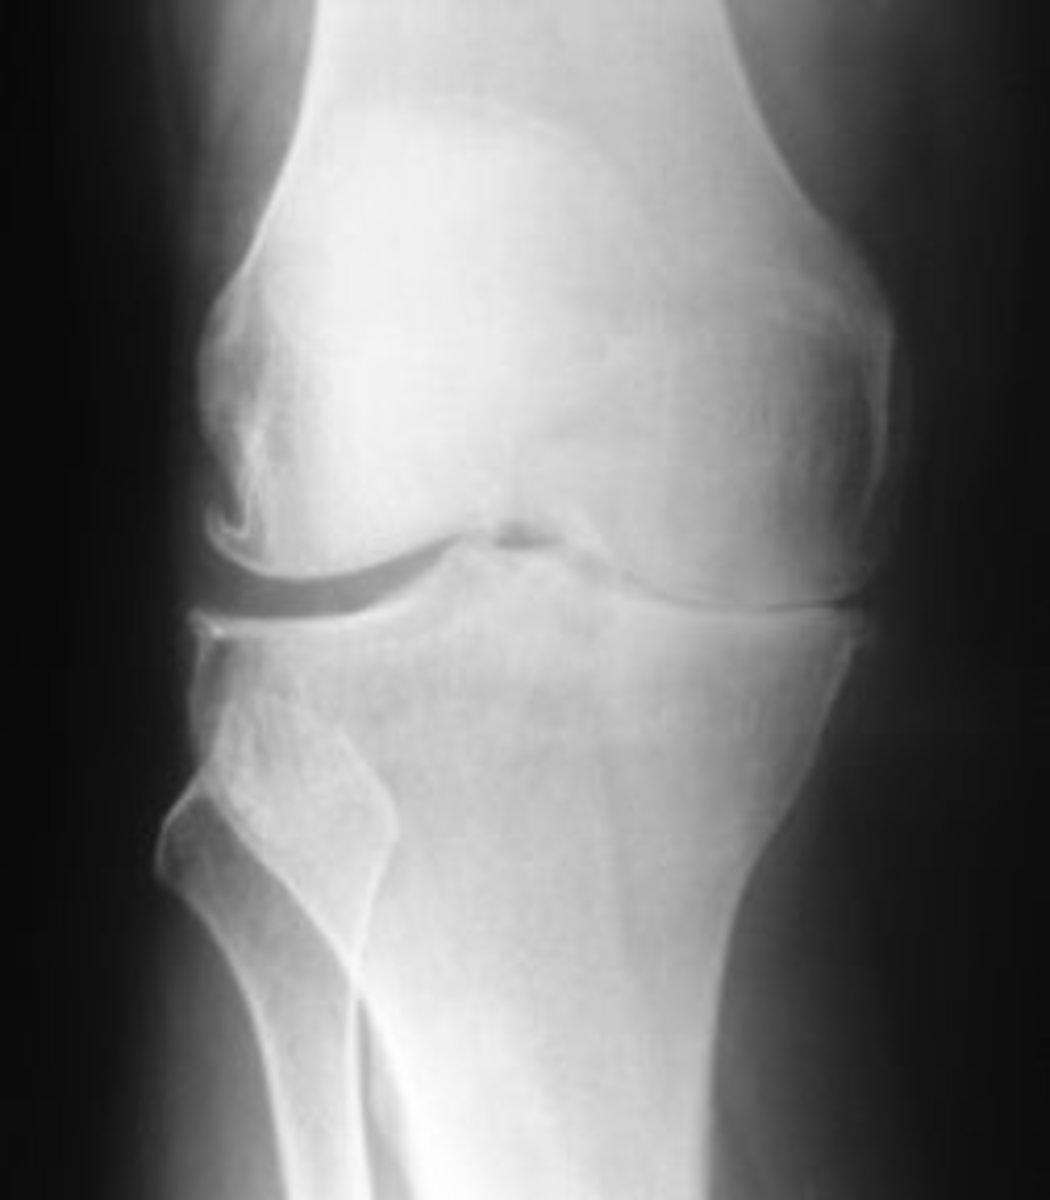 Knee X-ray - Understanding the signs of Arthritis